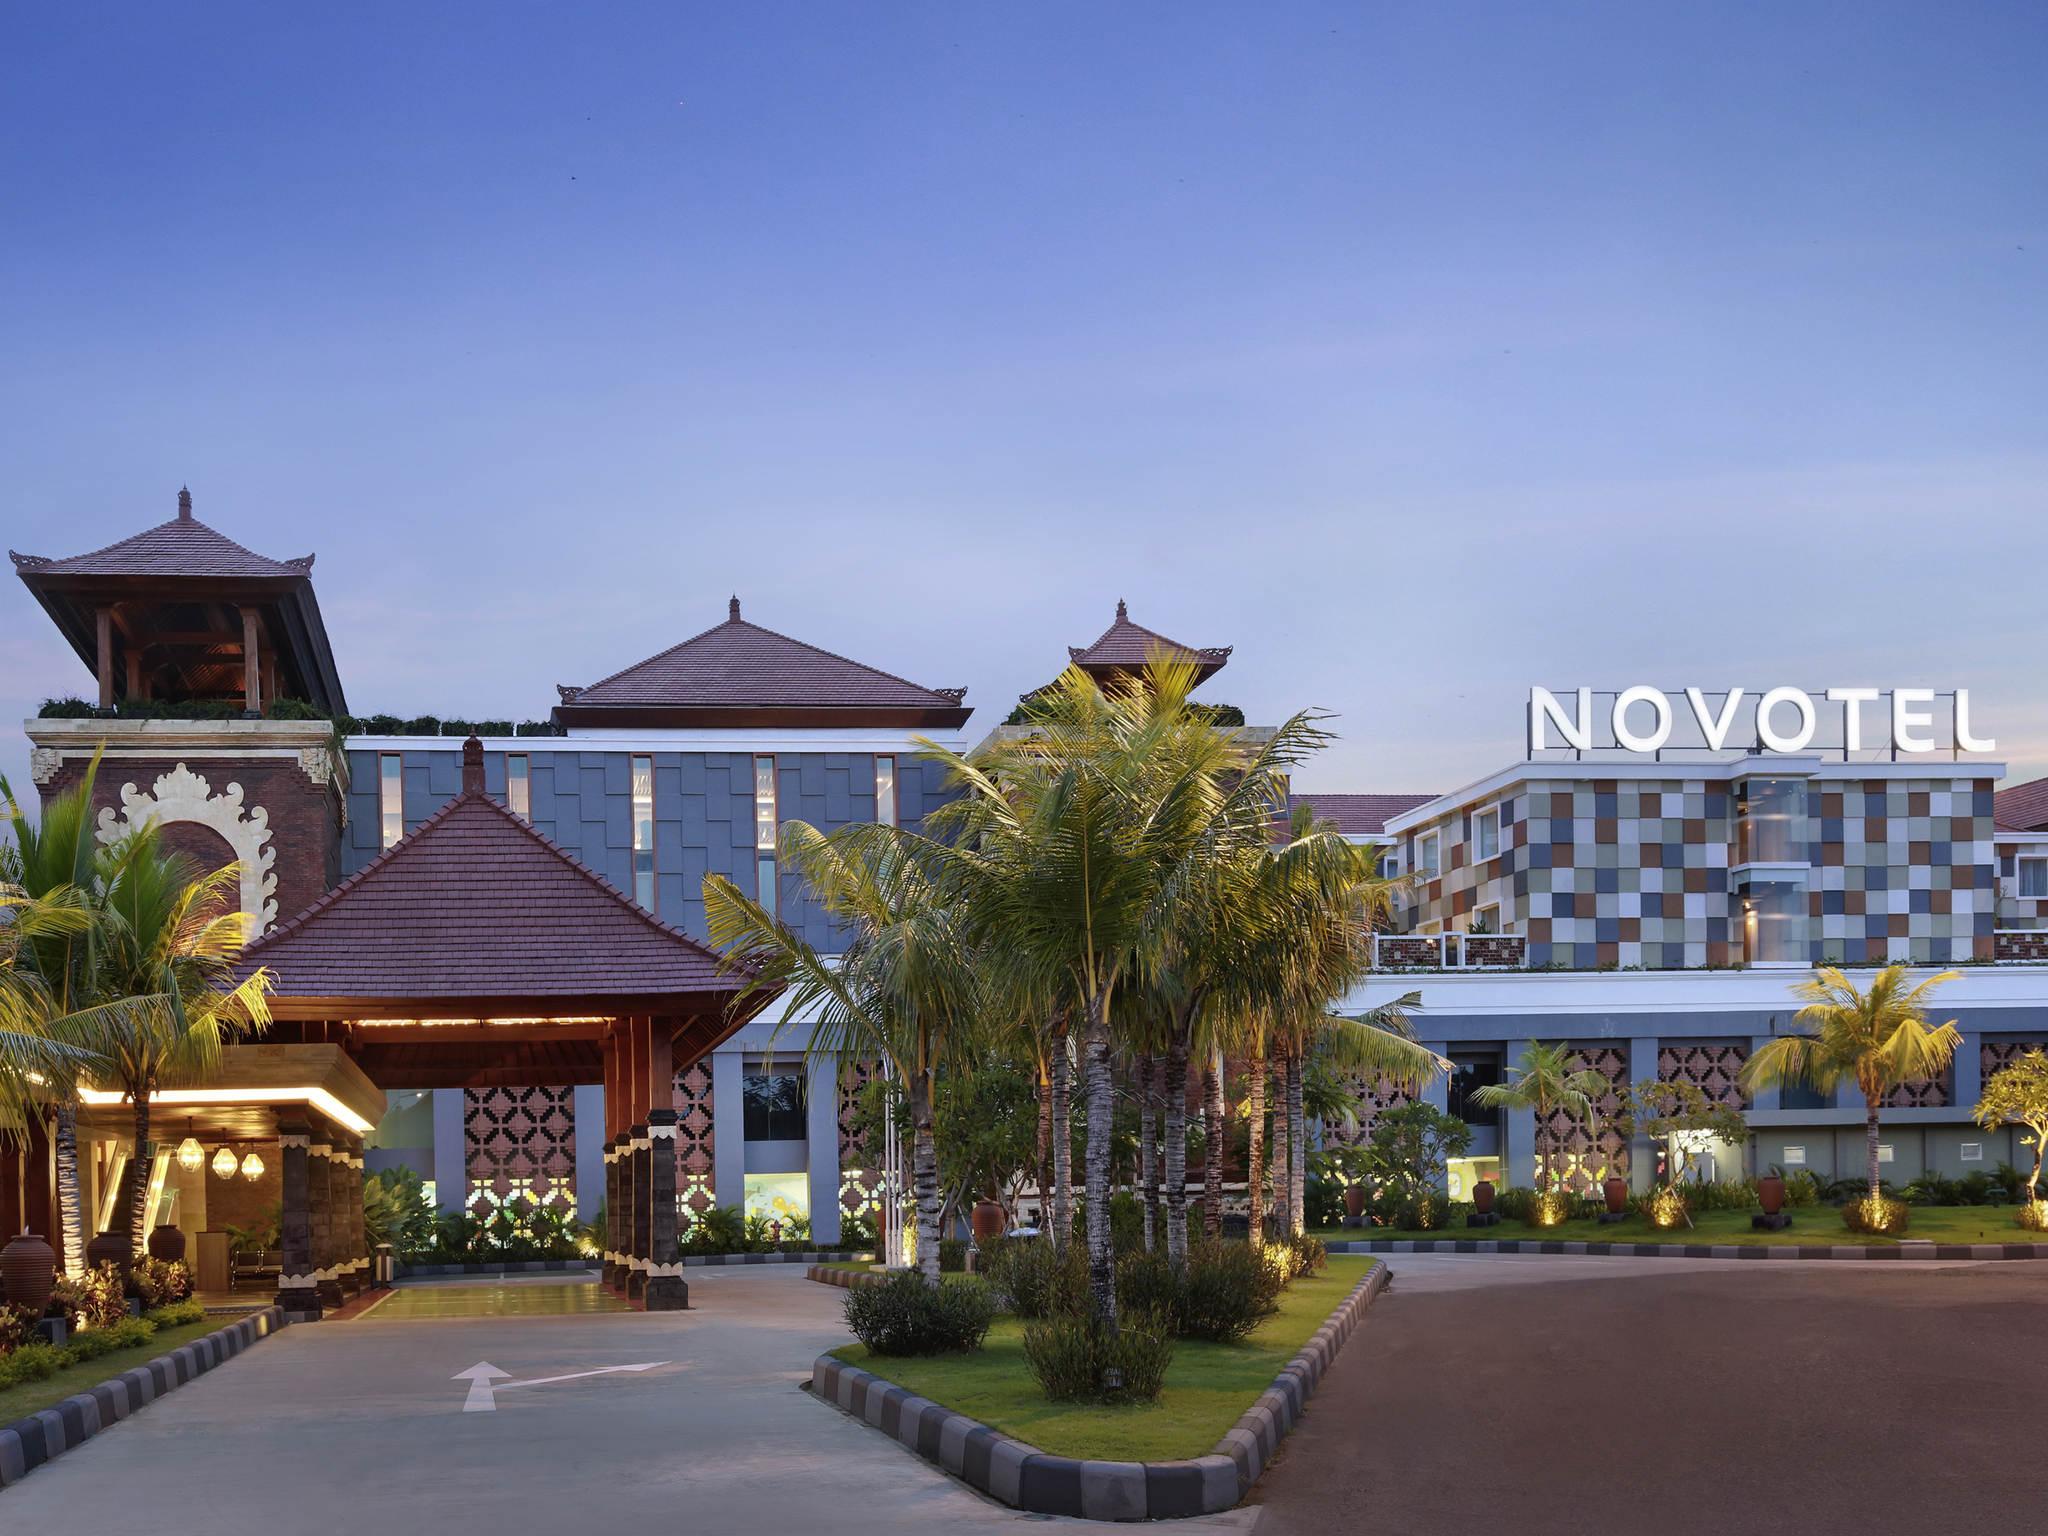 Hotell – Novotel Bali Ngurah Rai Airport